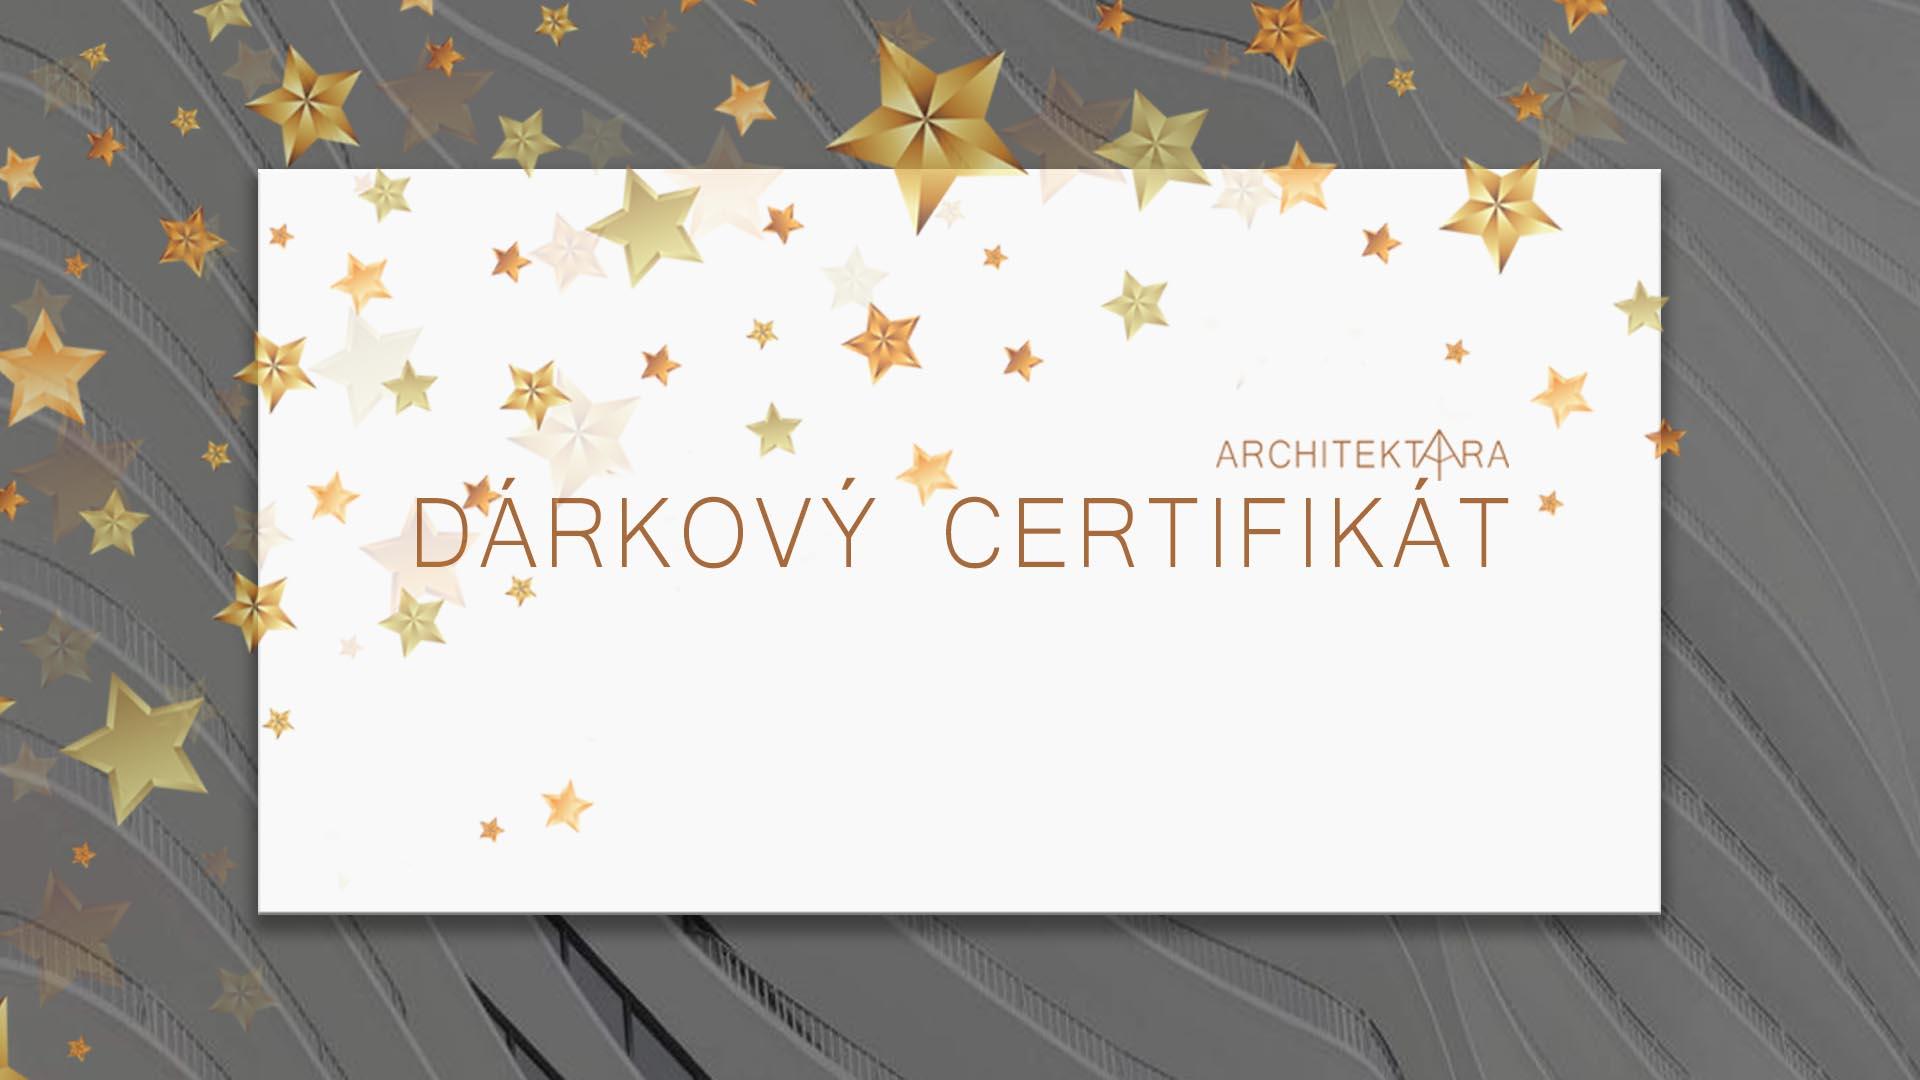 Darkovy certifikat